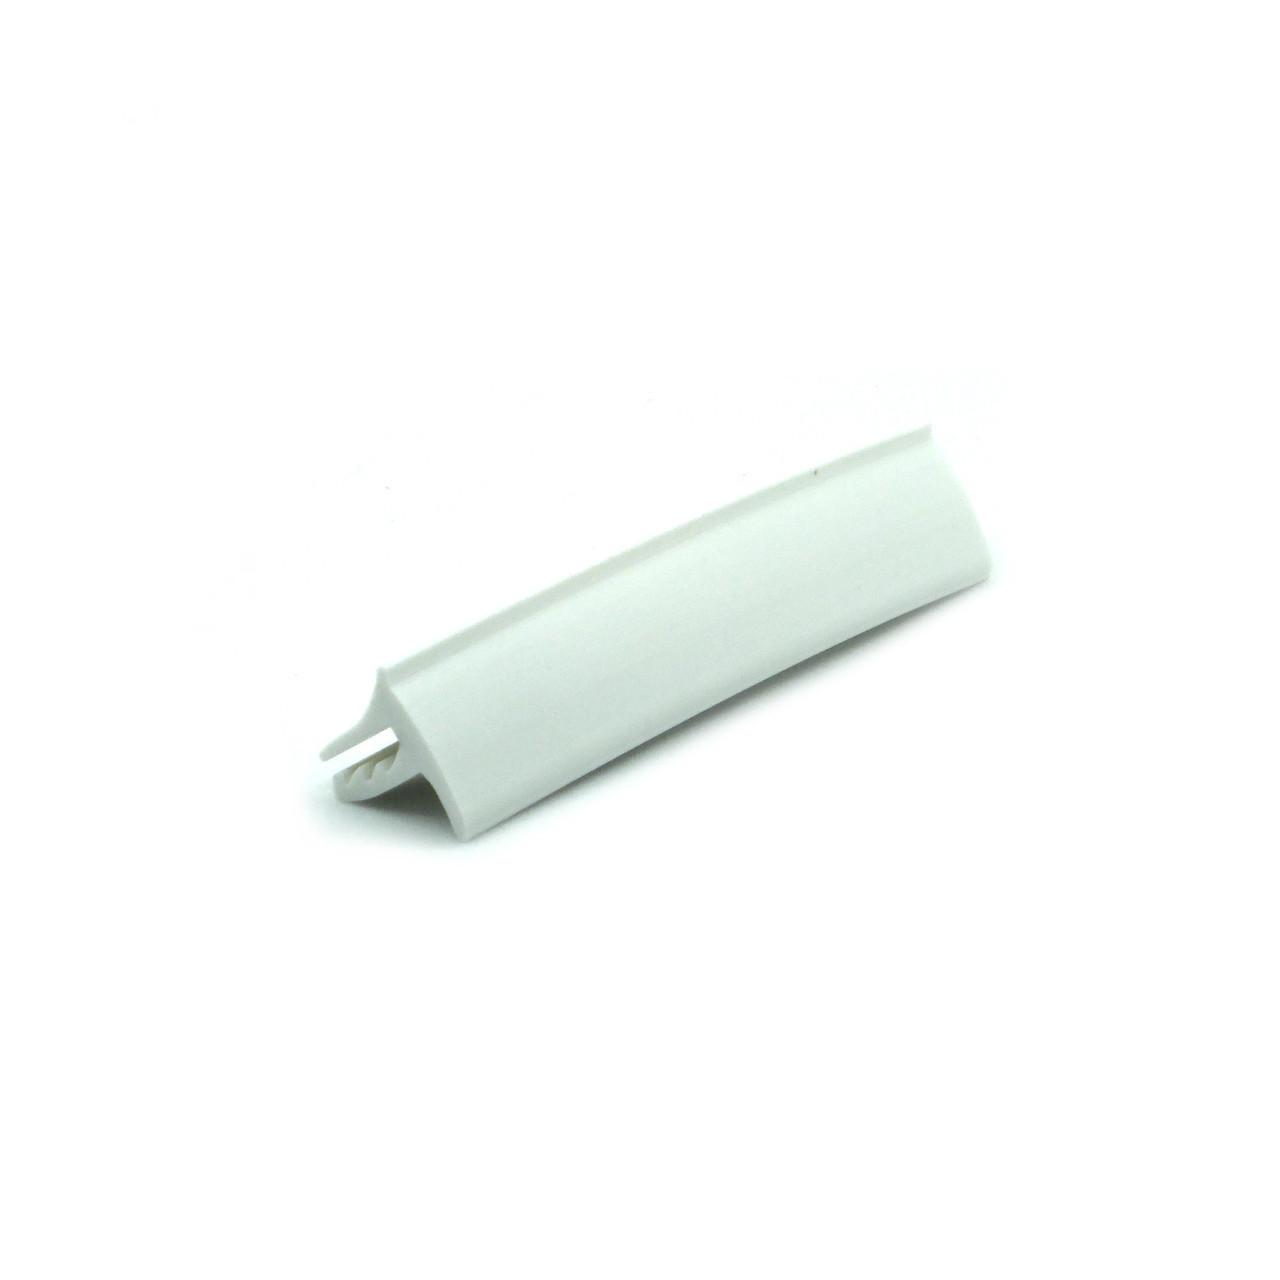 Вставка заглушка декоративная для натяжного потолка 2А (10 мм, 3 зуба)